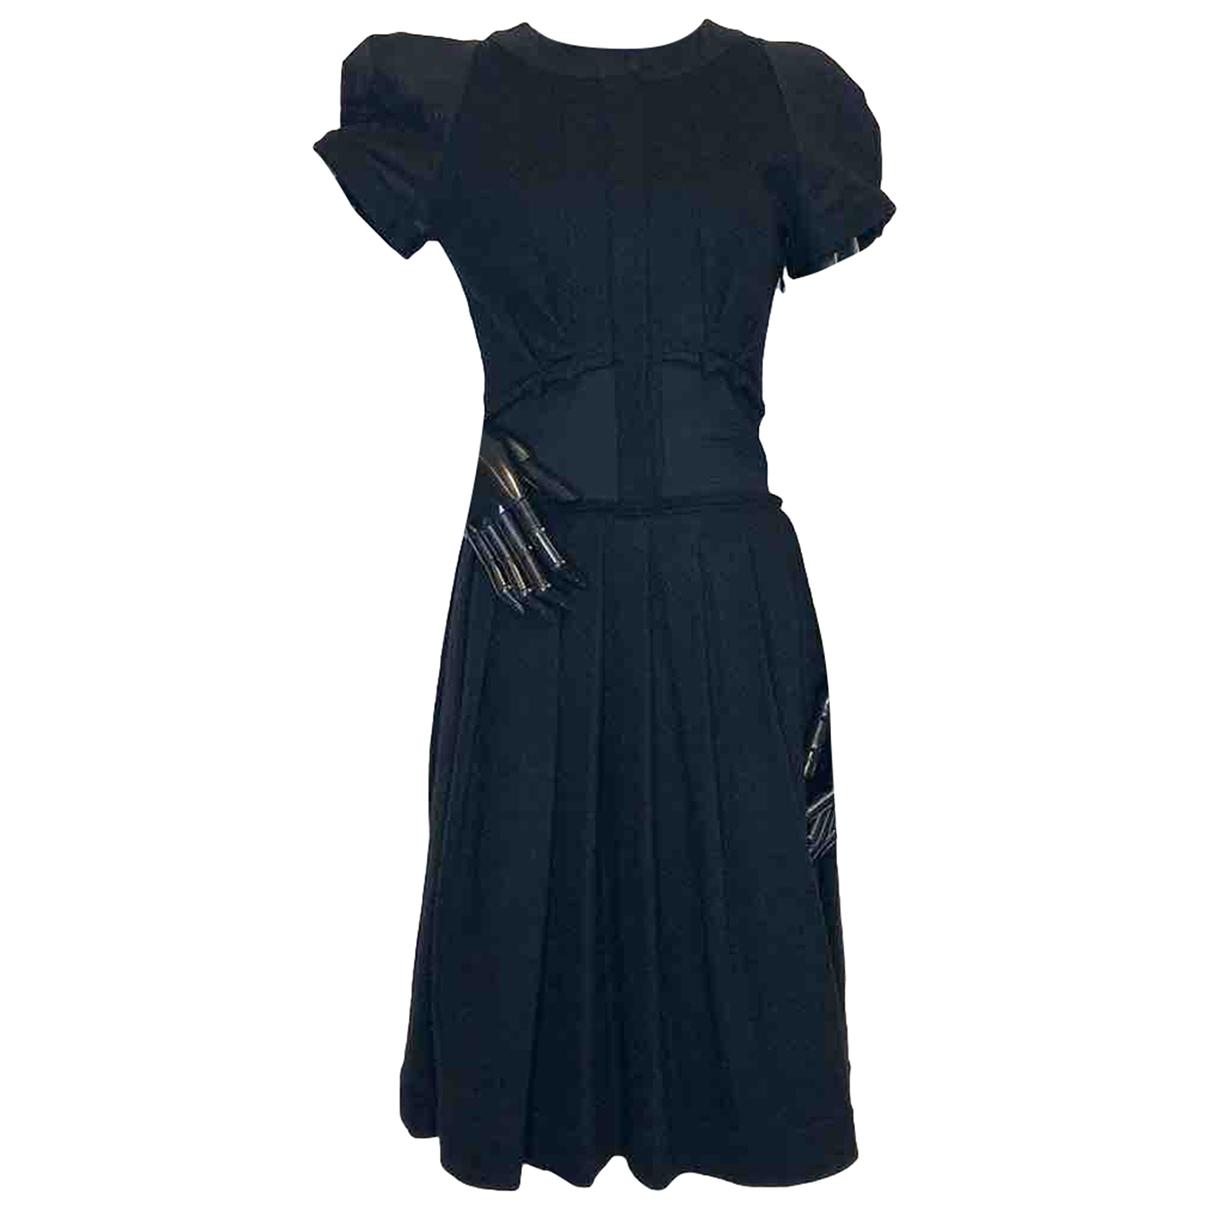 Viktor & Rolf \N Black Wool dress for Women 38 IT